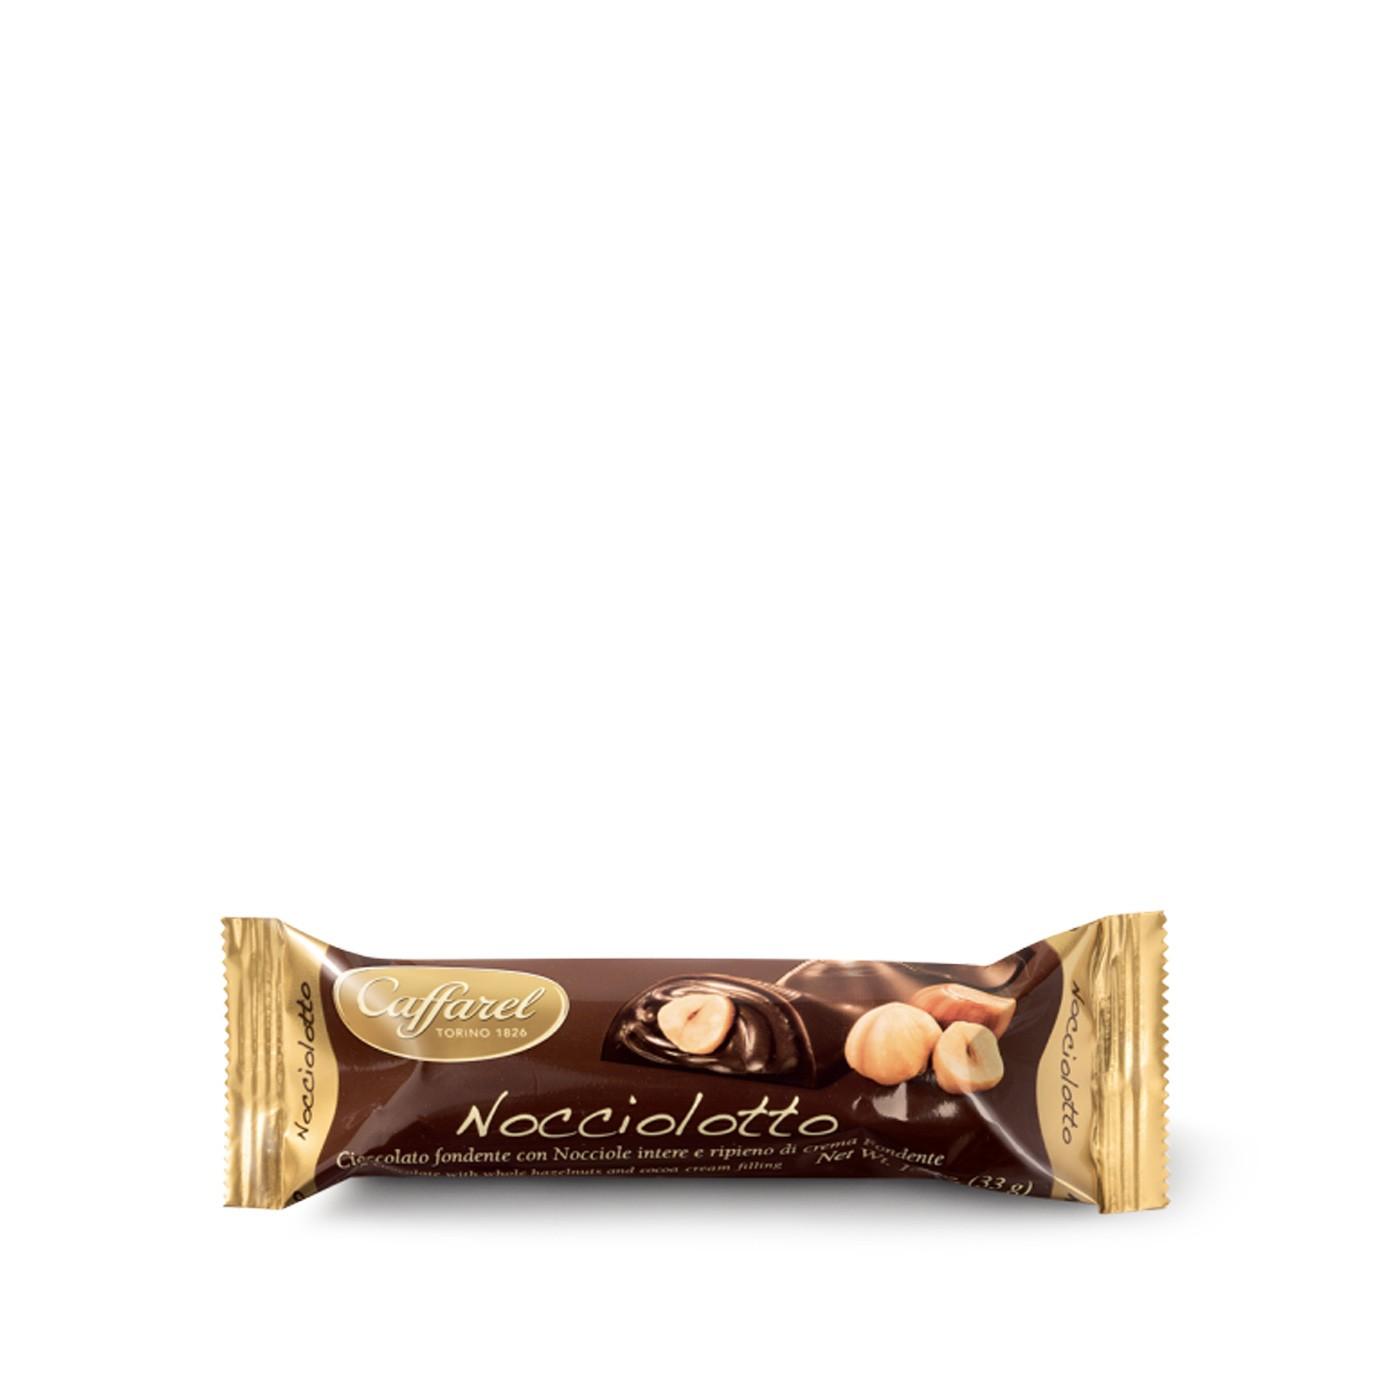 I Love Dark Chocolate Bar 1 oz